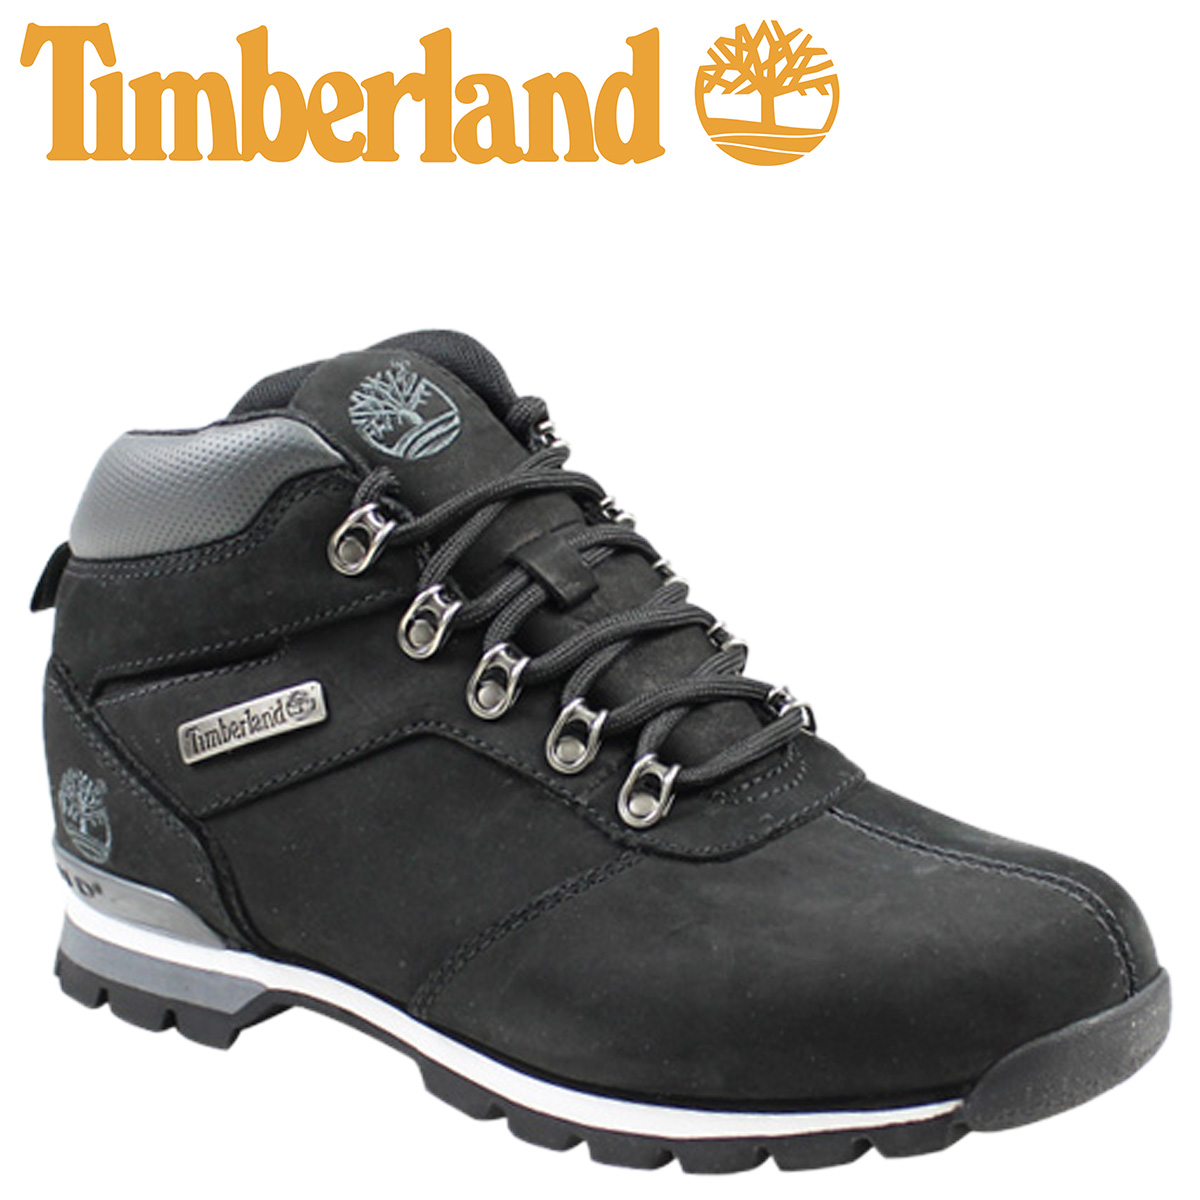 6692dc6a963b Sugar Online Shop  Timberland Timberland euro hiker FTB split lock 2 ...